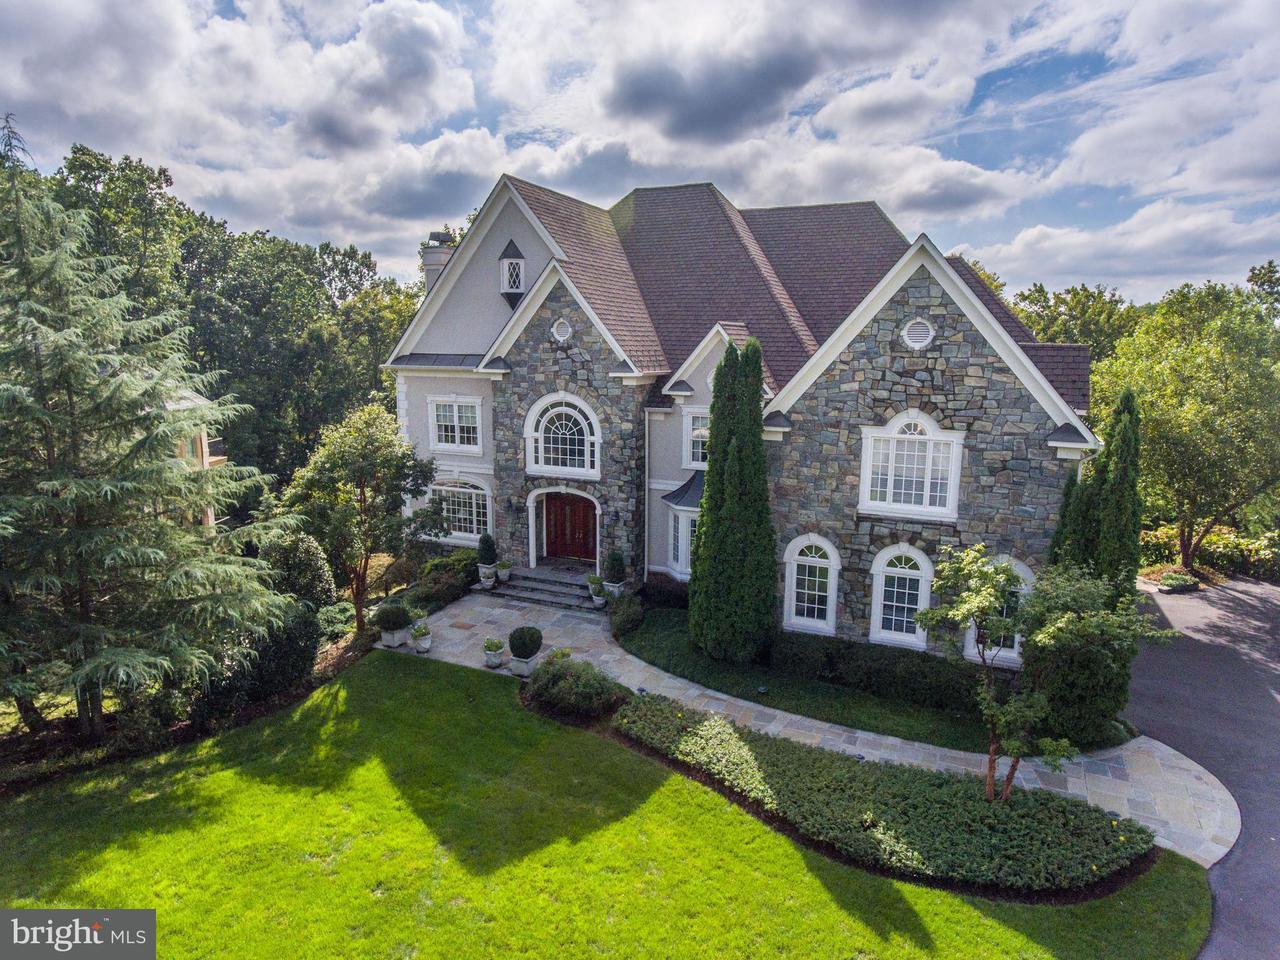 Single Family Home for Sale at 11371 Jackrabbit Court 11371 Jackrabbit Court Sterling, Virginia 20165 United States